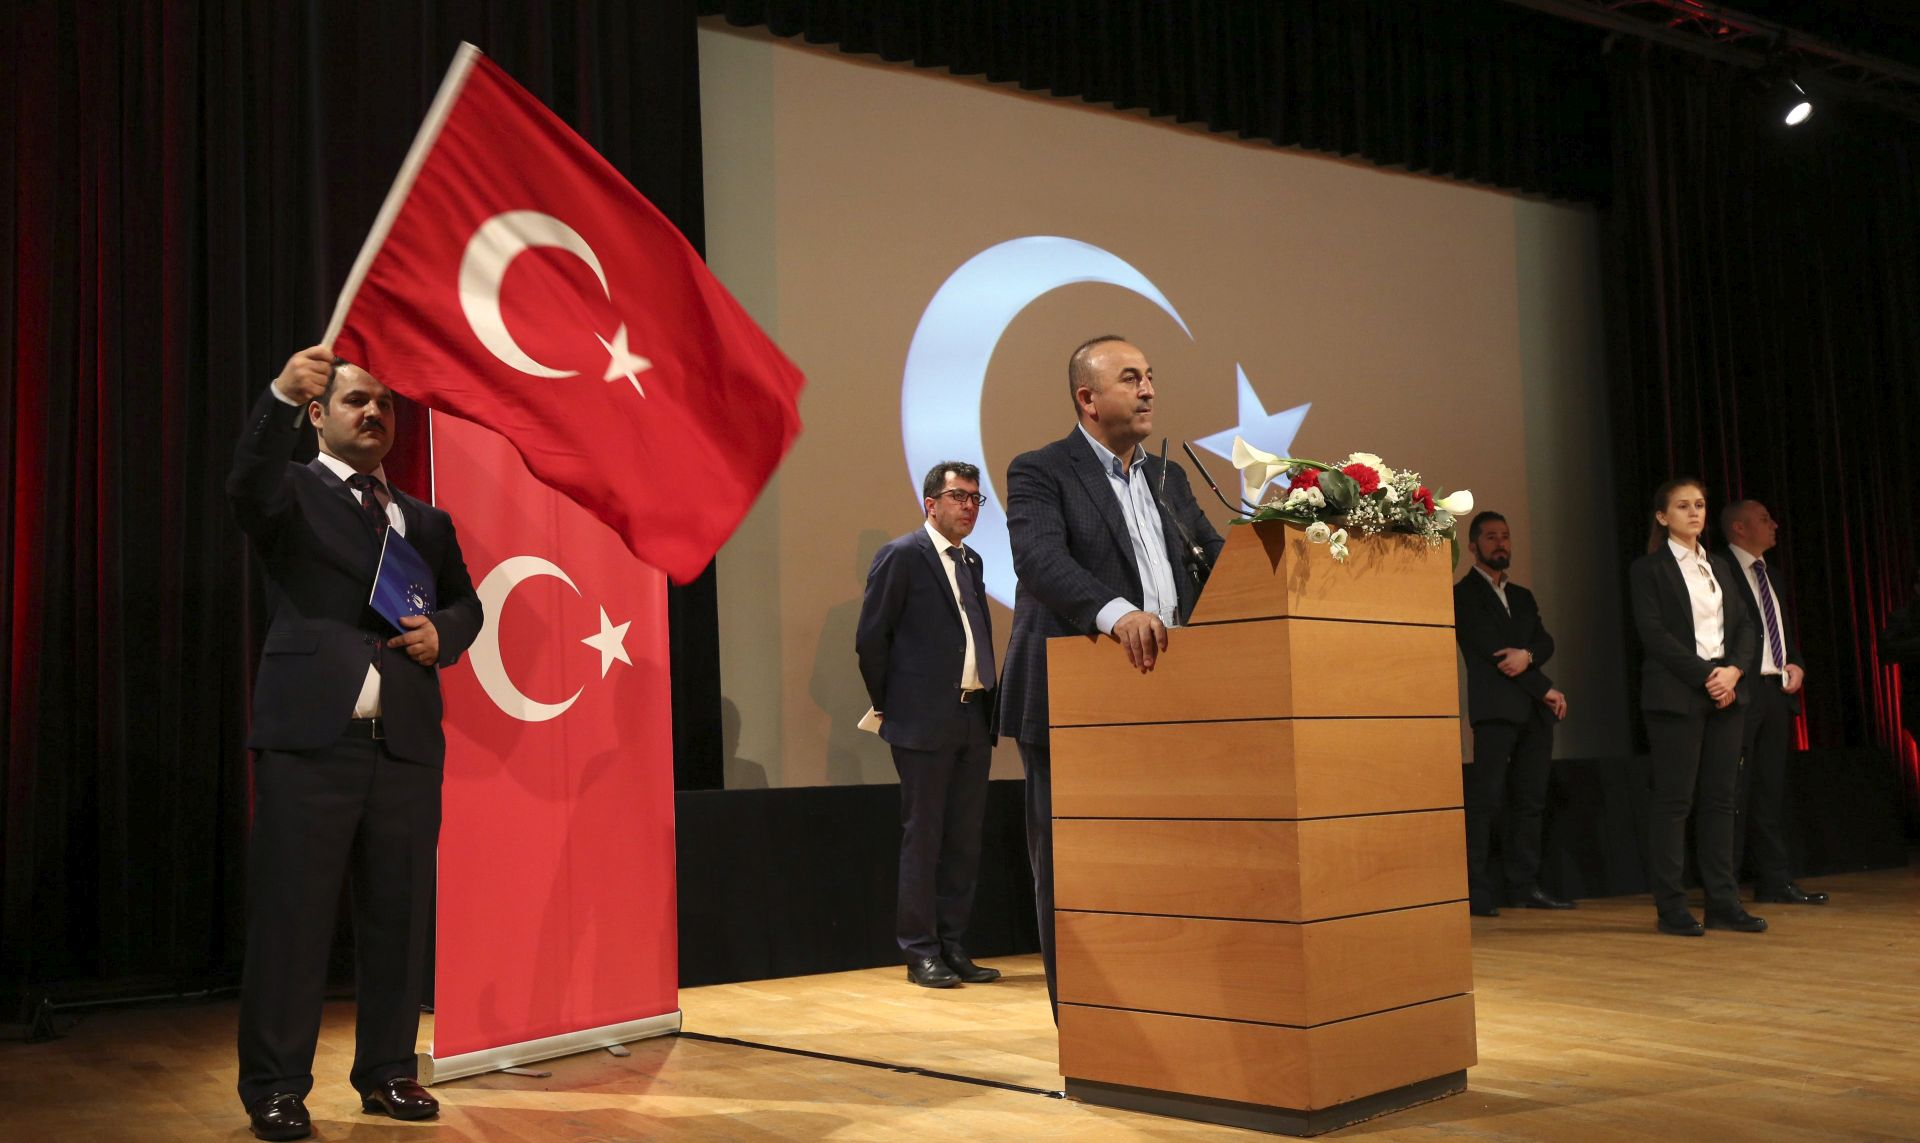 Turska bi mogla suspendirati sporazum s EU o migrantima